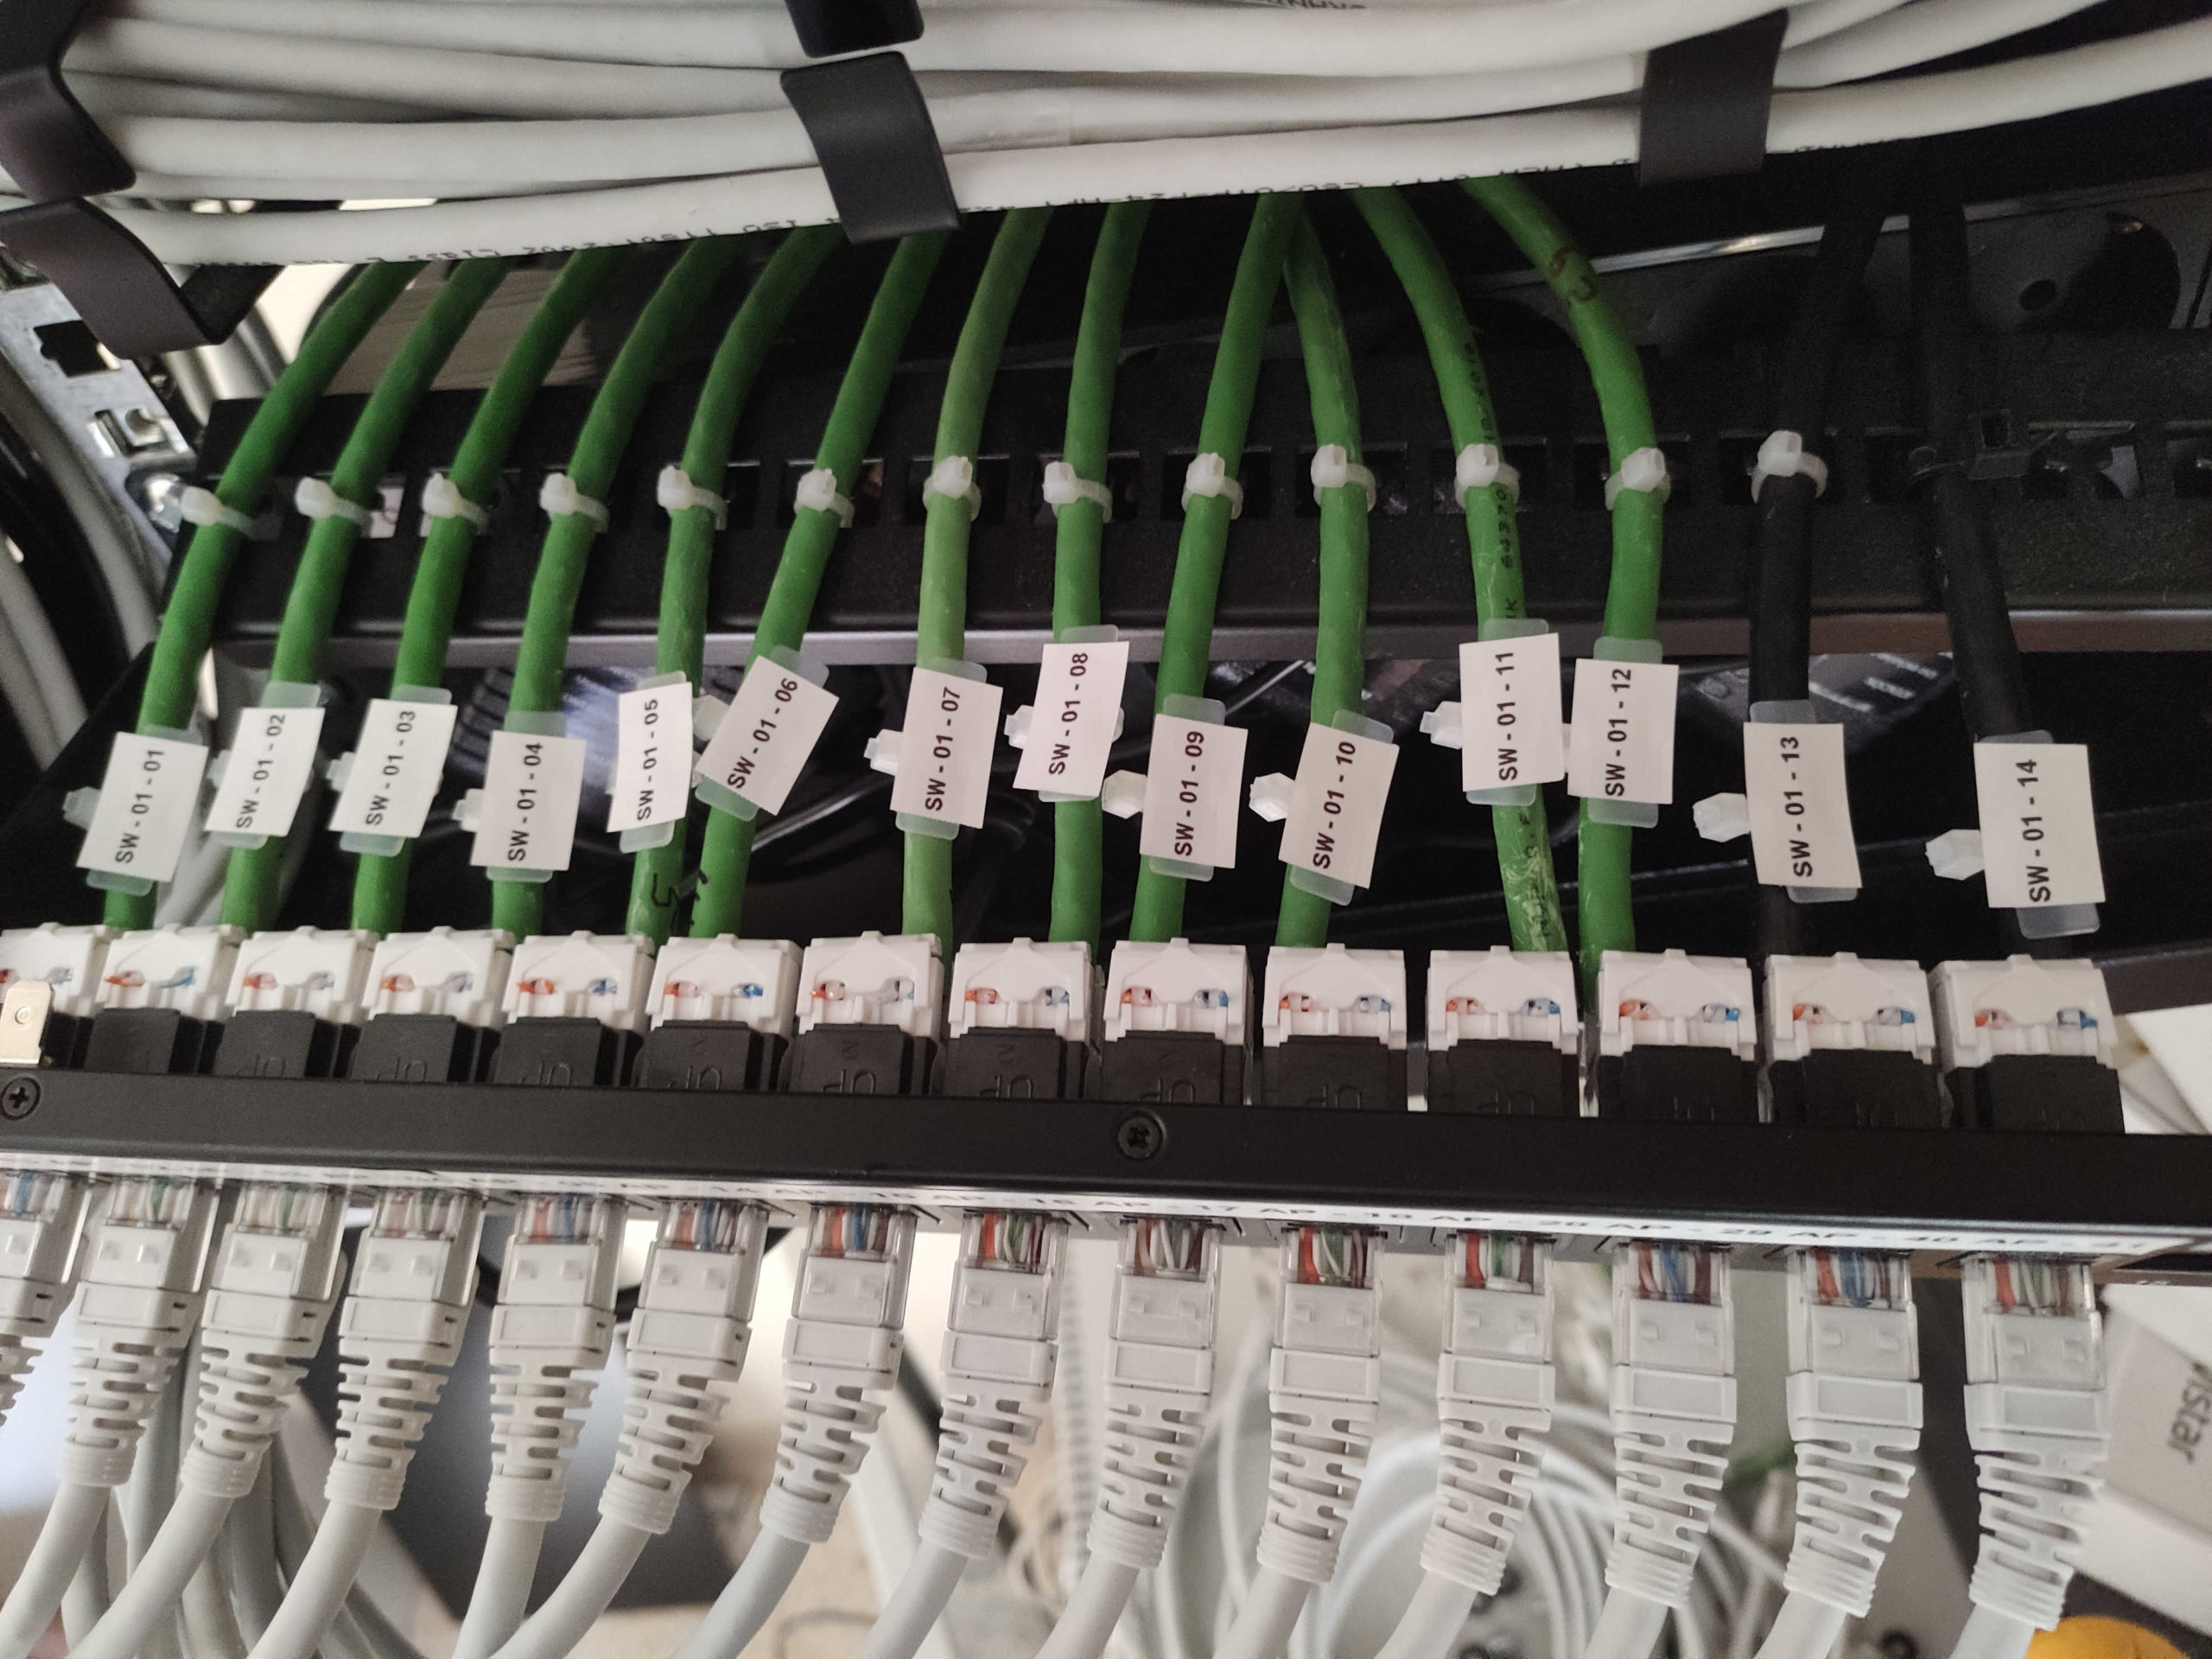 Configuración de cable de red